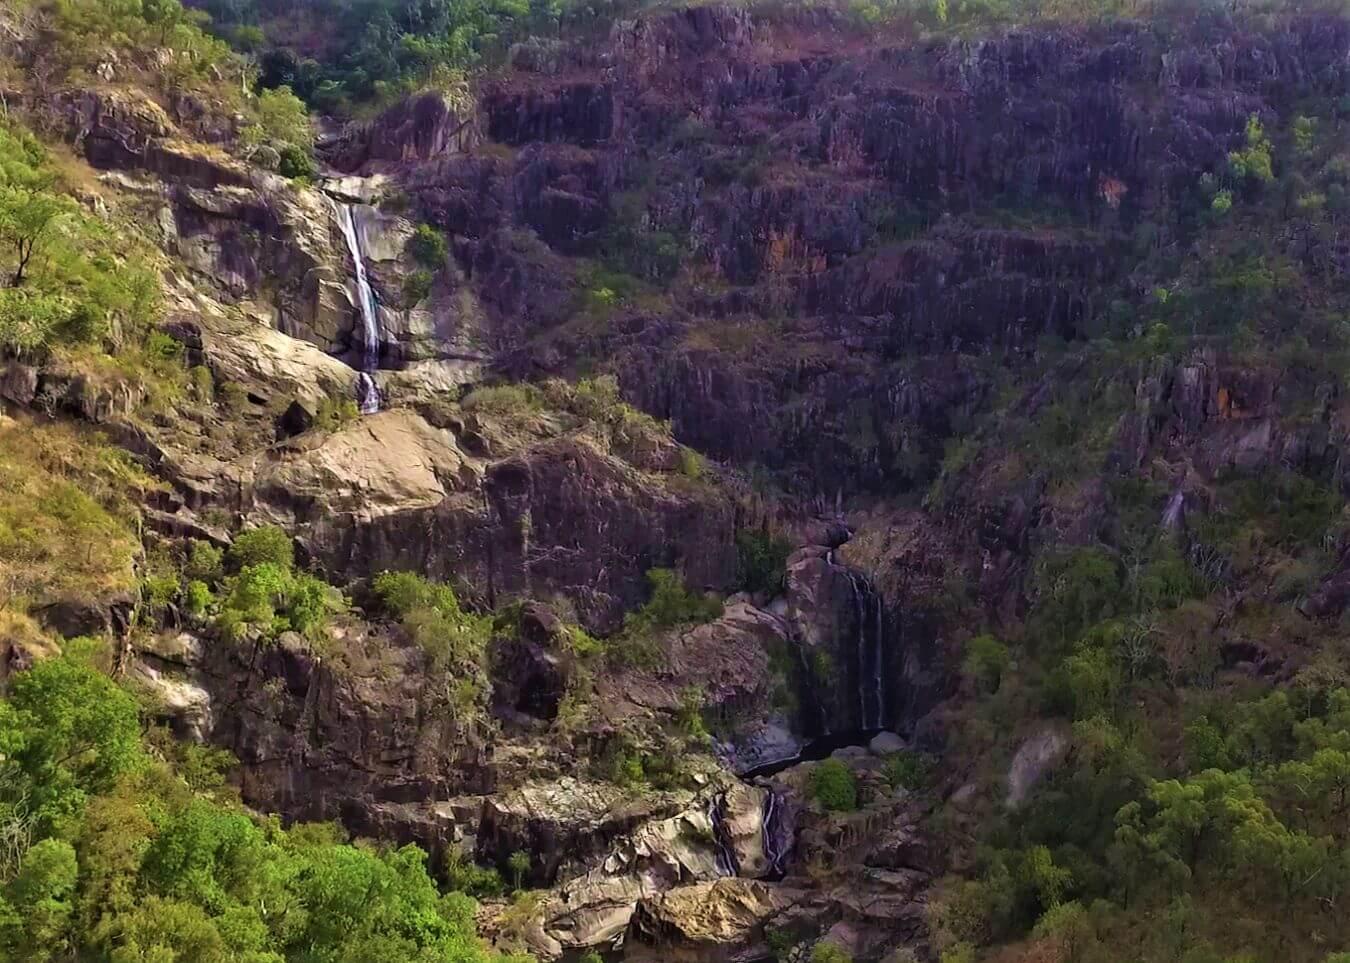 Wasserfall im Regenwald - Jourama Falls